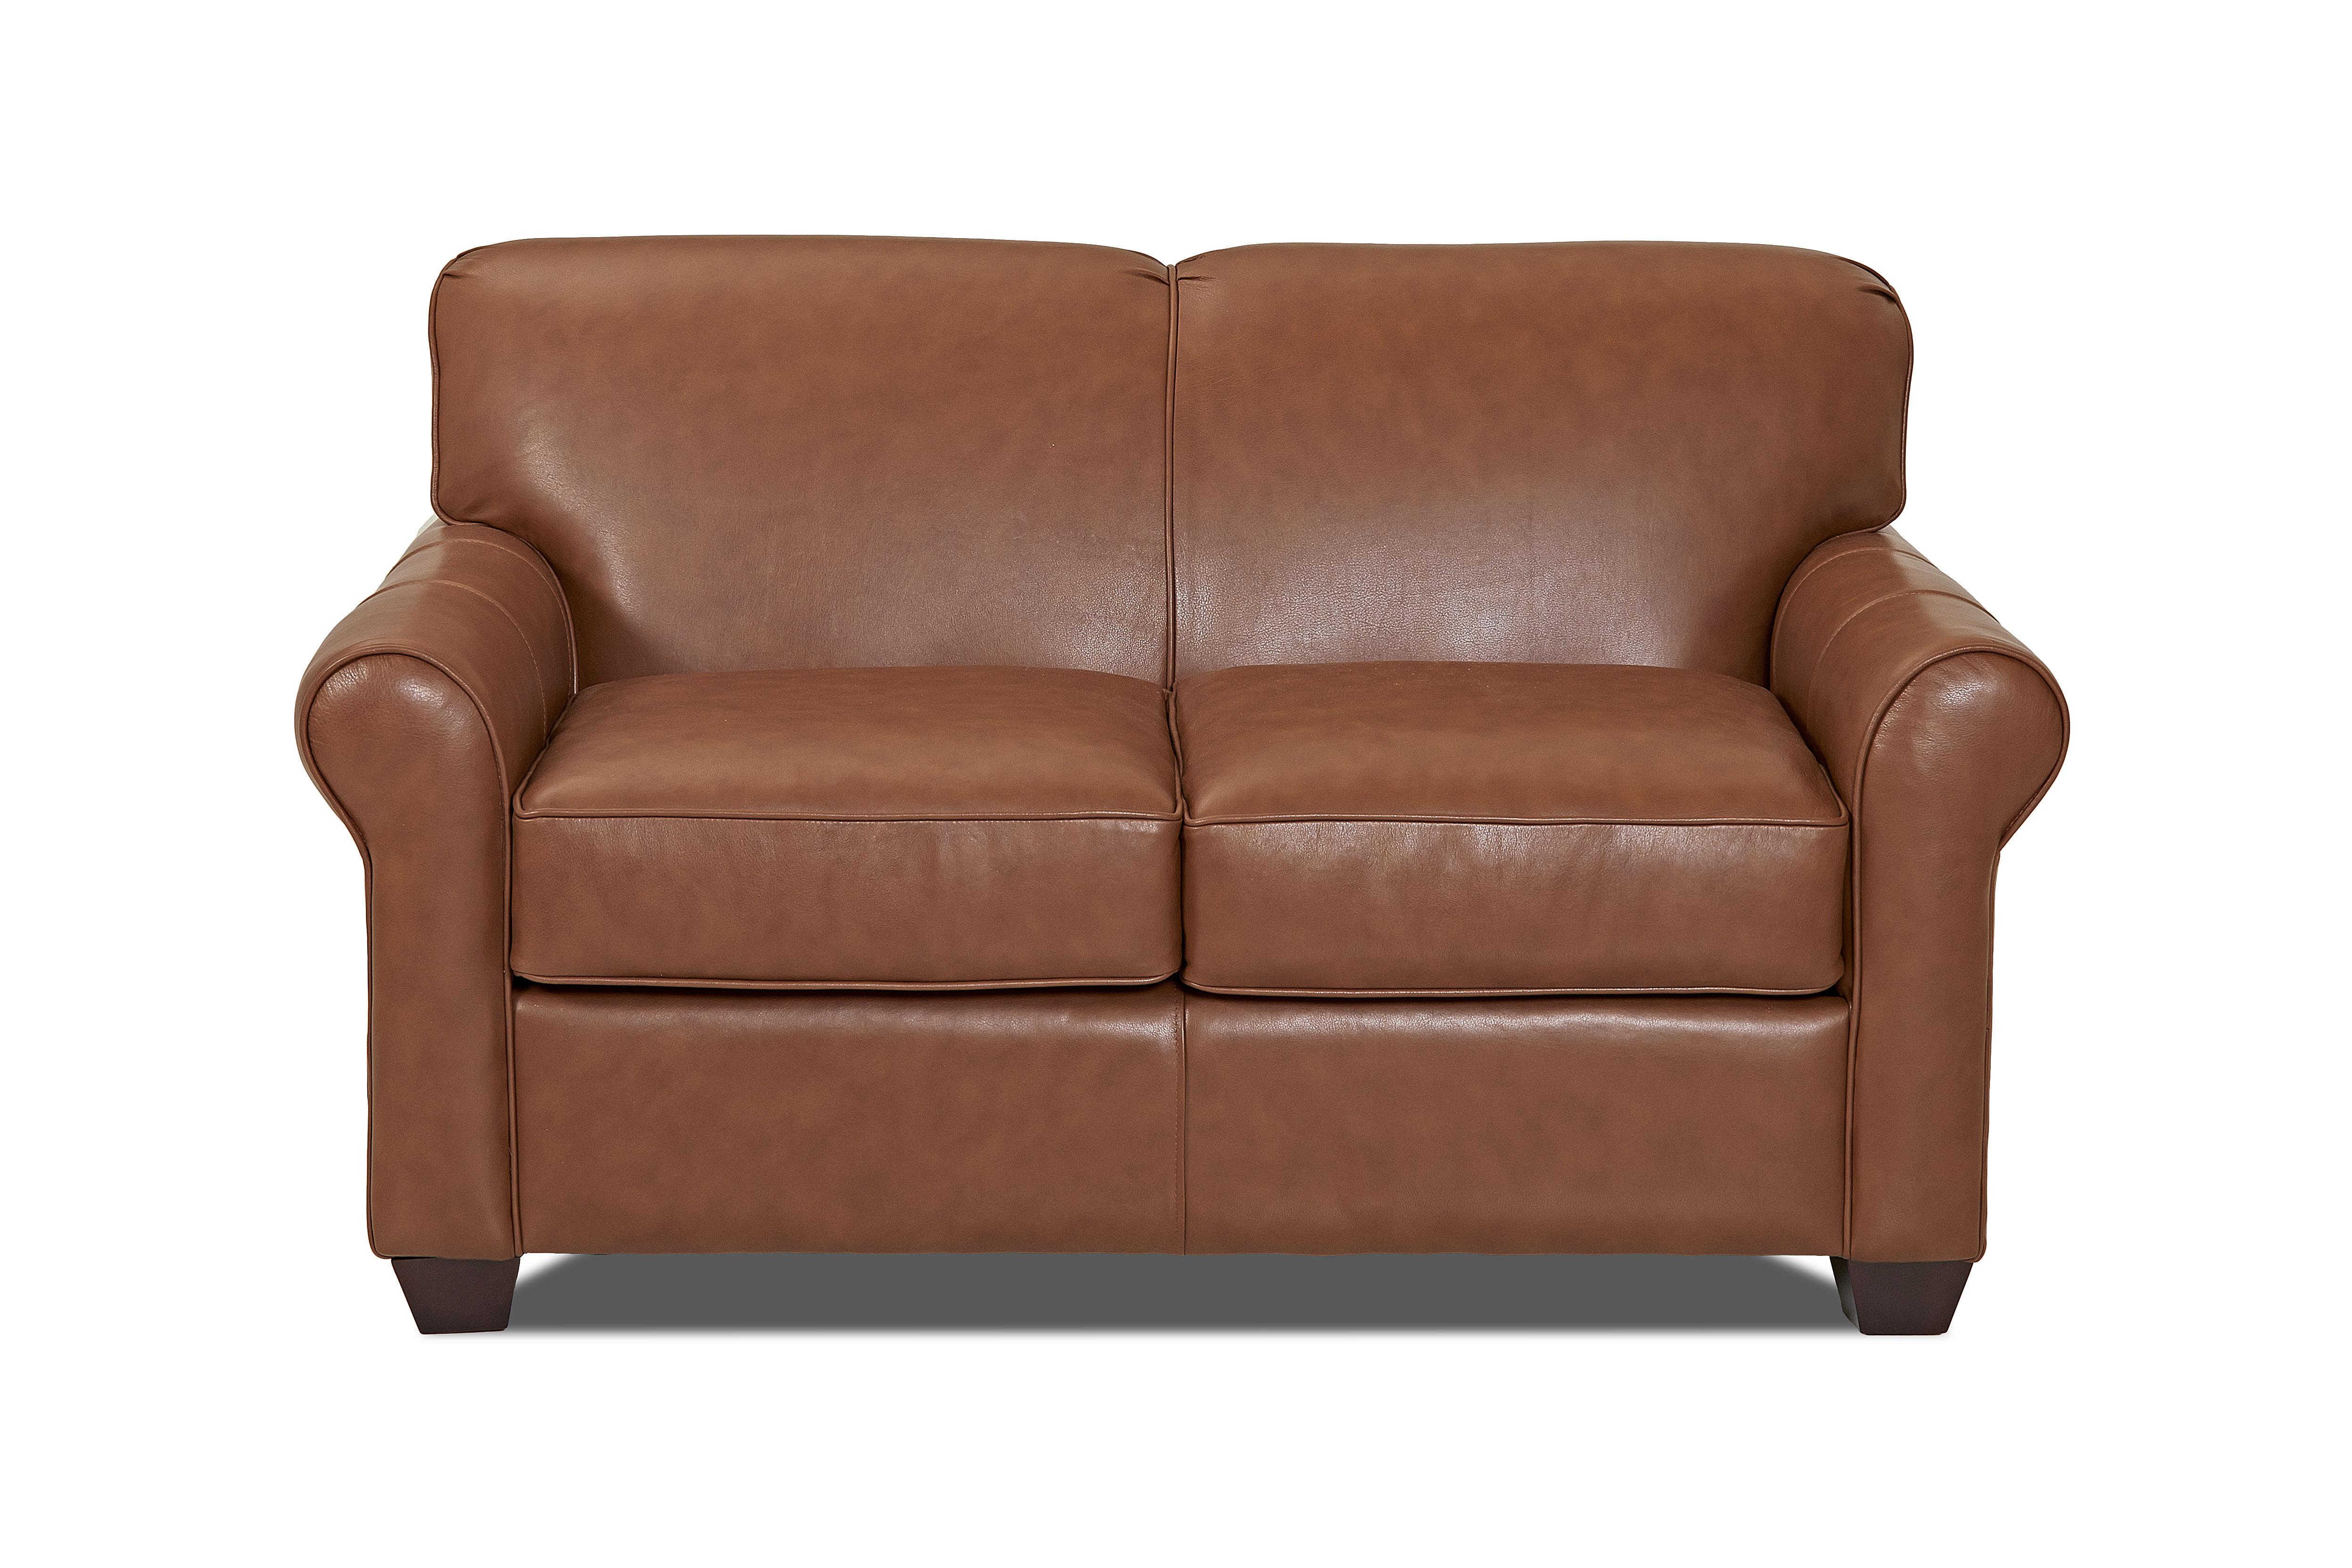 Wayfair Custom Upholstery™ Jennifer Leather Loveseat & Reviews | Wayfair